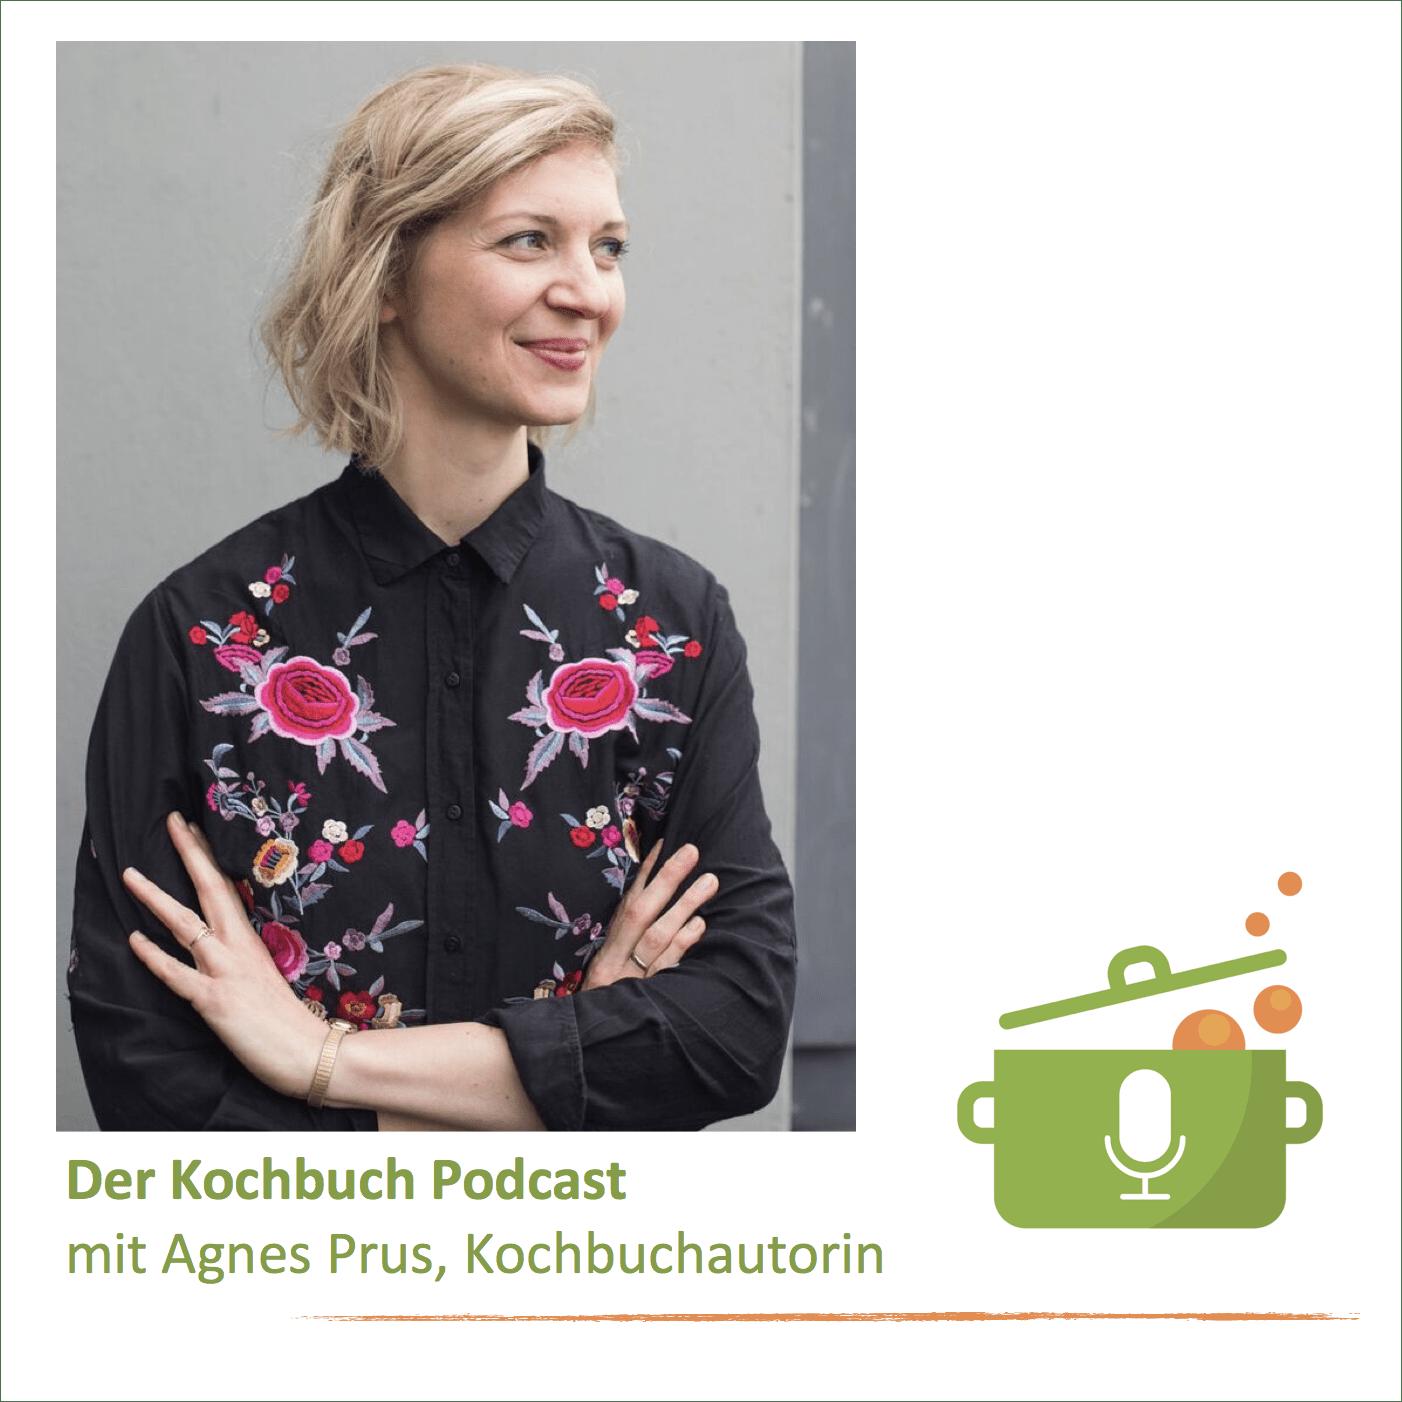 Der Kochbuch Podcast mit Kochbuchautorin Agnes Prus